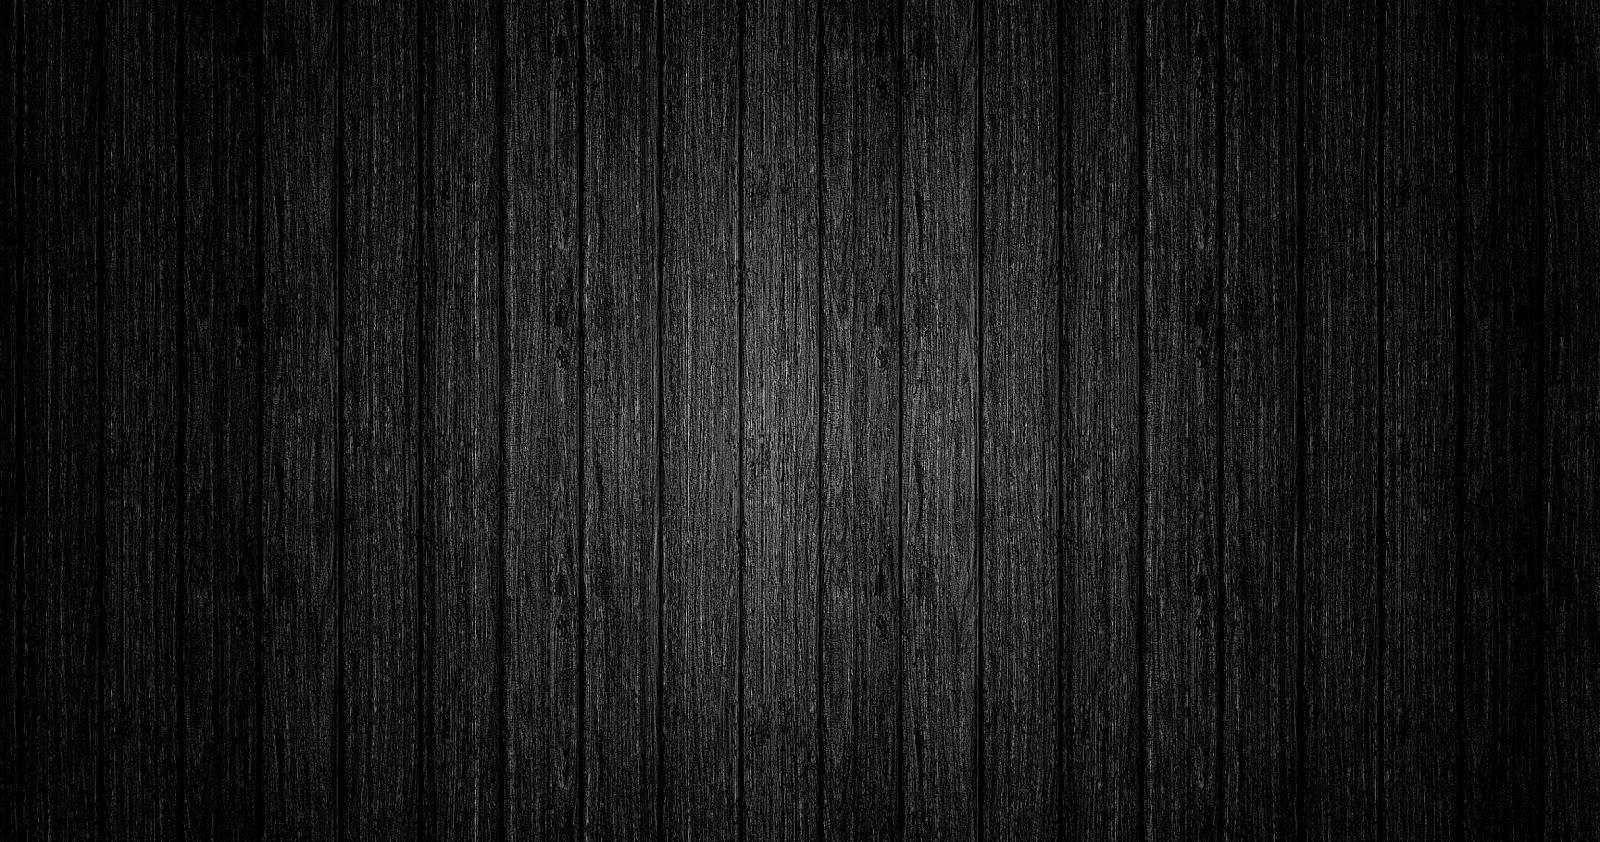 3d Wallpaper For Nexus 5 Texture Wallpapers Cool Hd Wallpapers